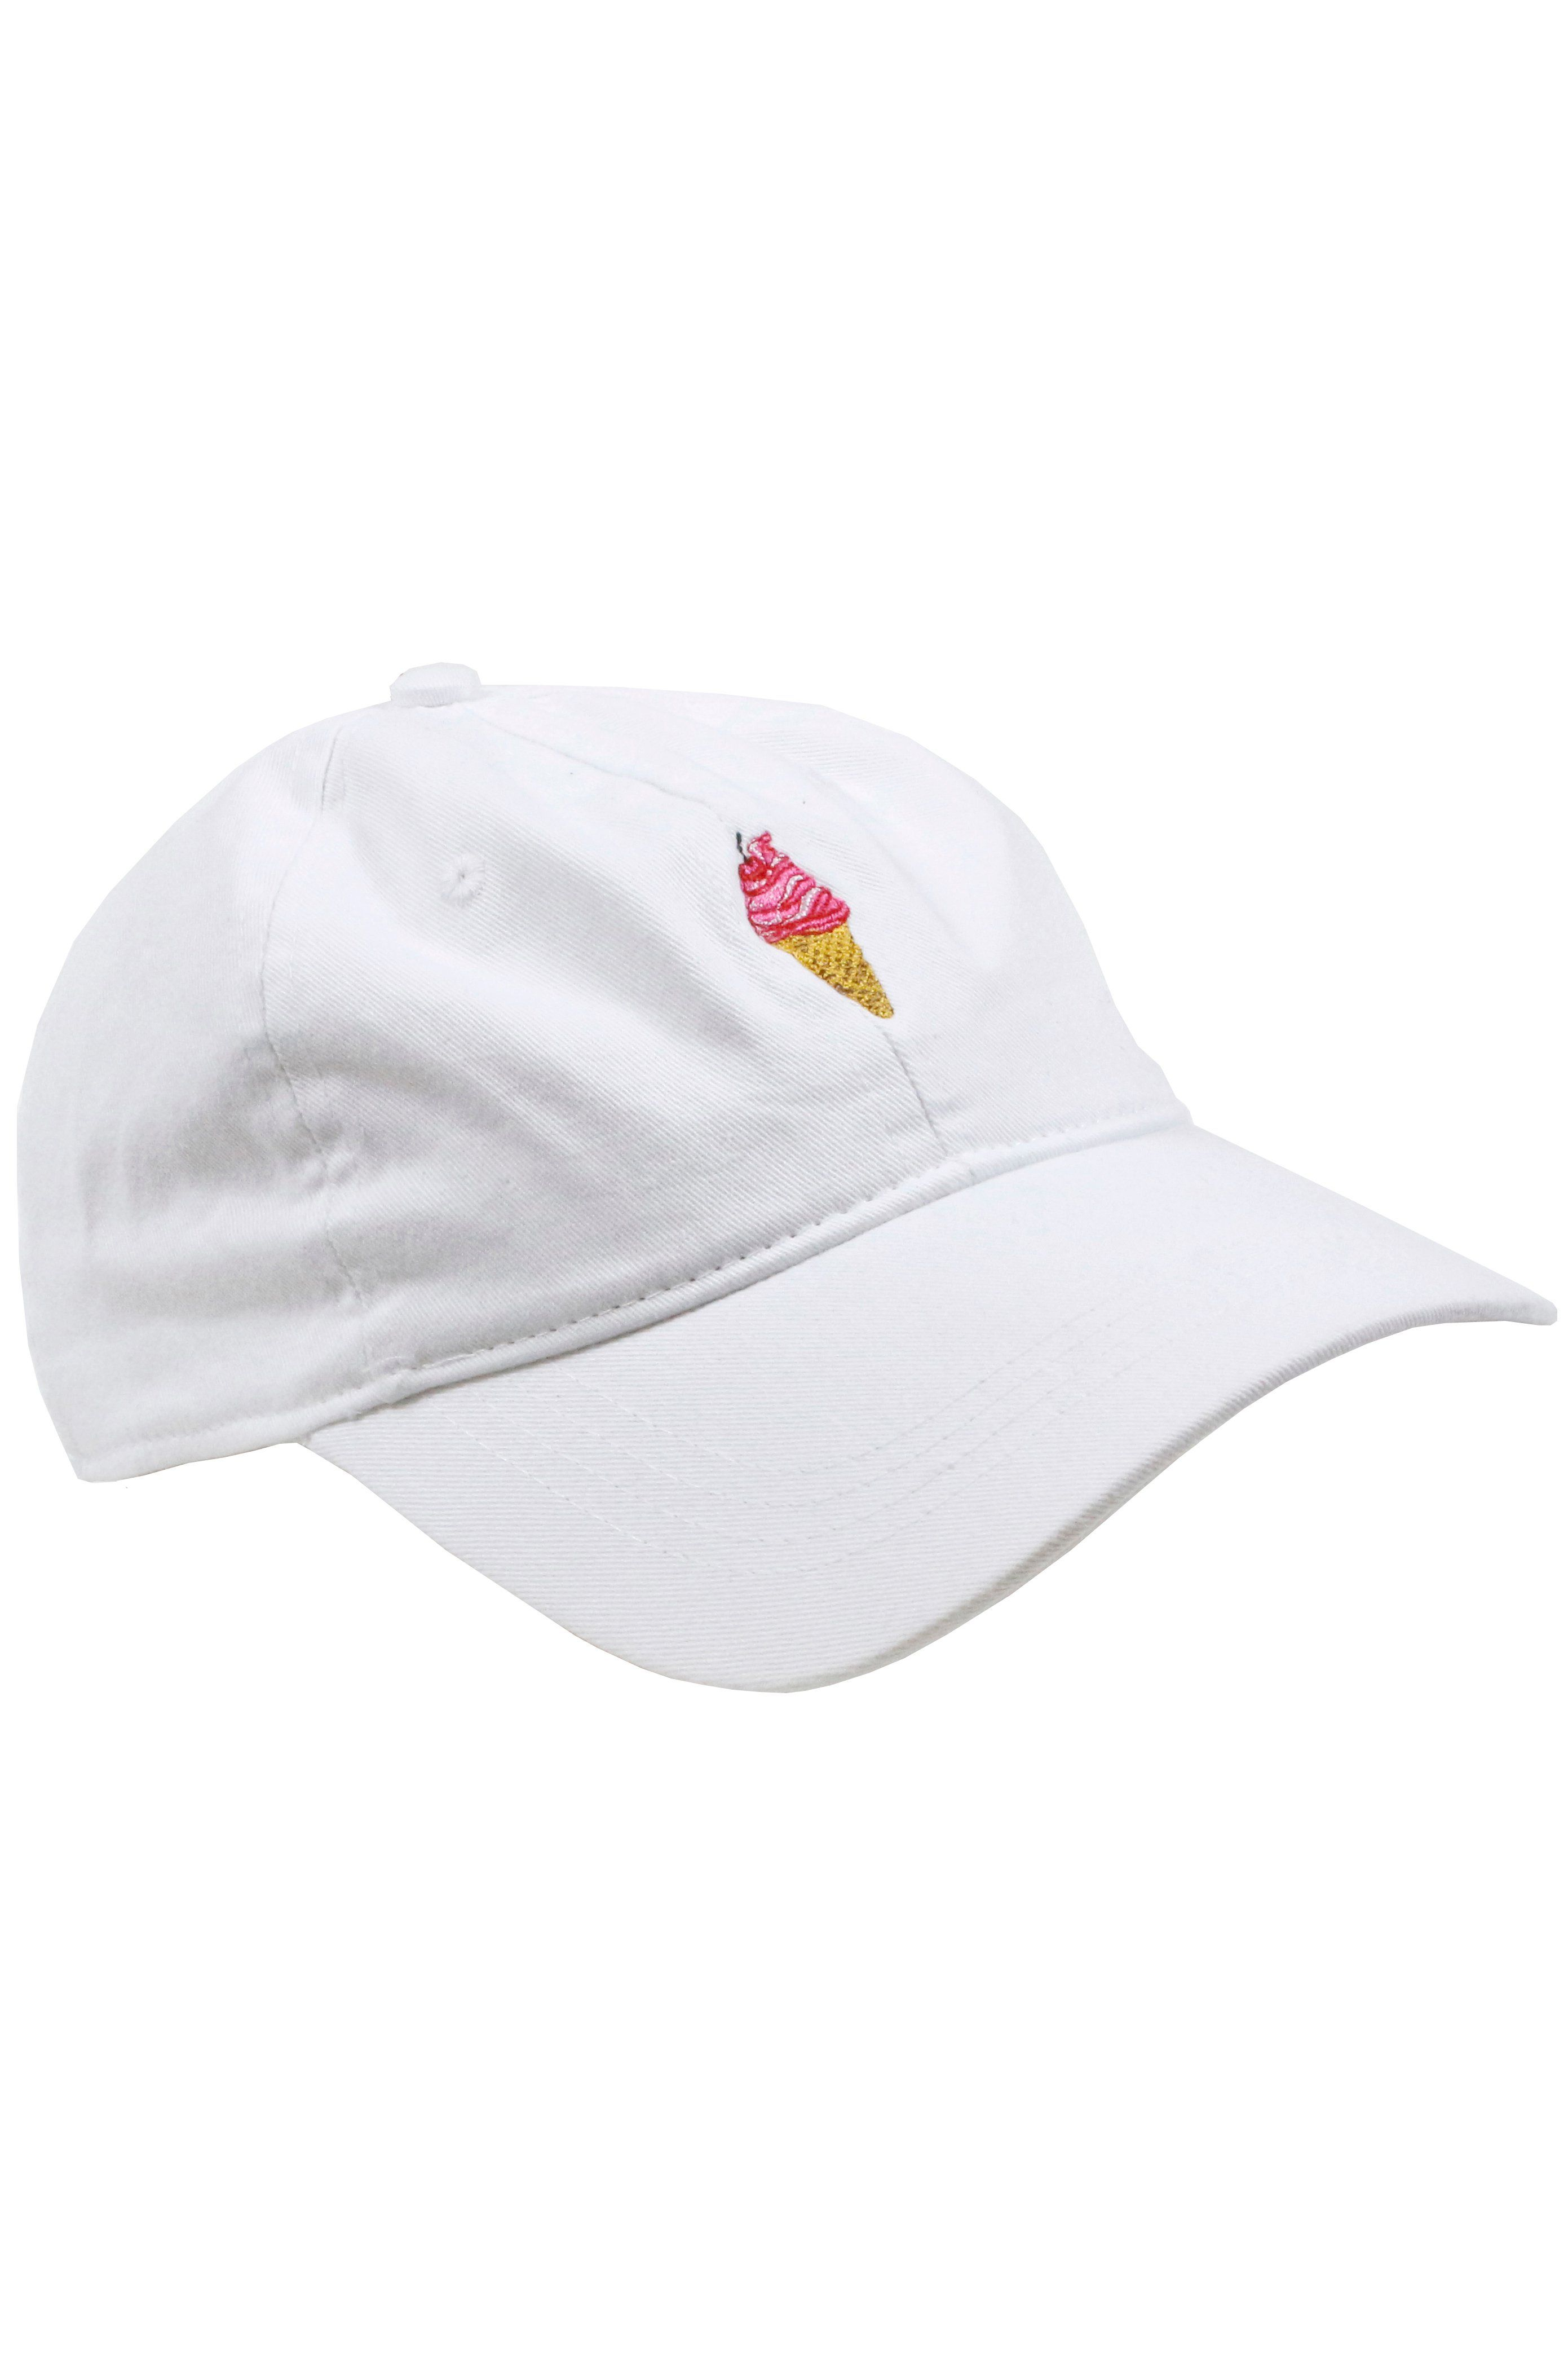 5bf91bddb73 Men s Ice Cream Cone Adjustable White Dad Hat